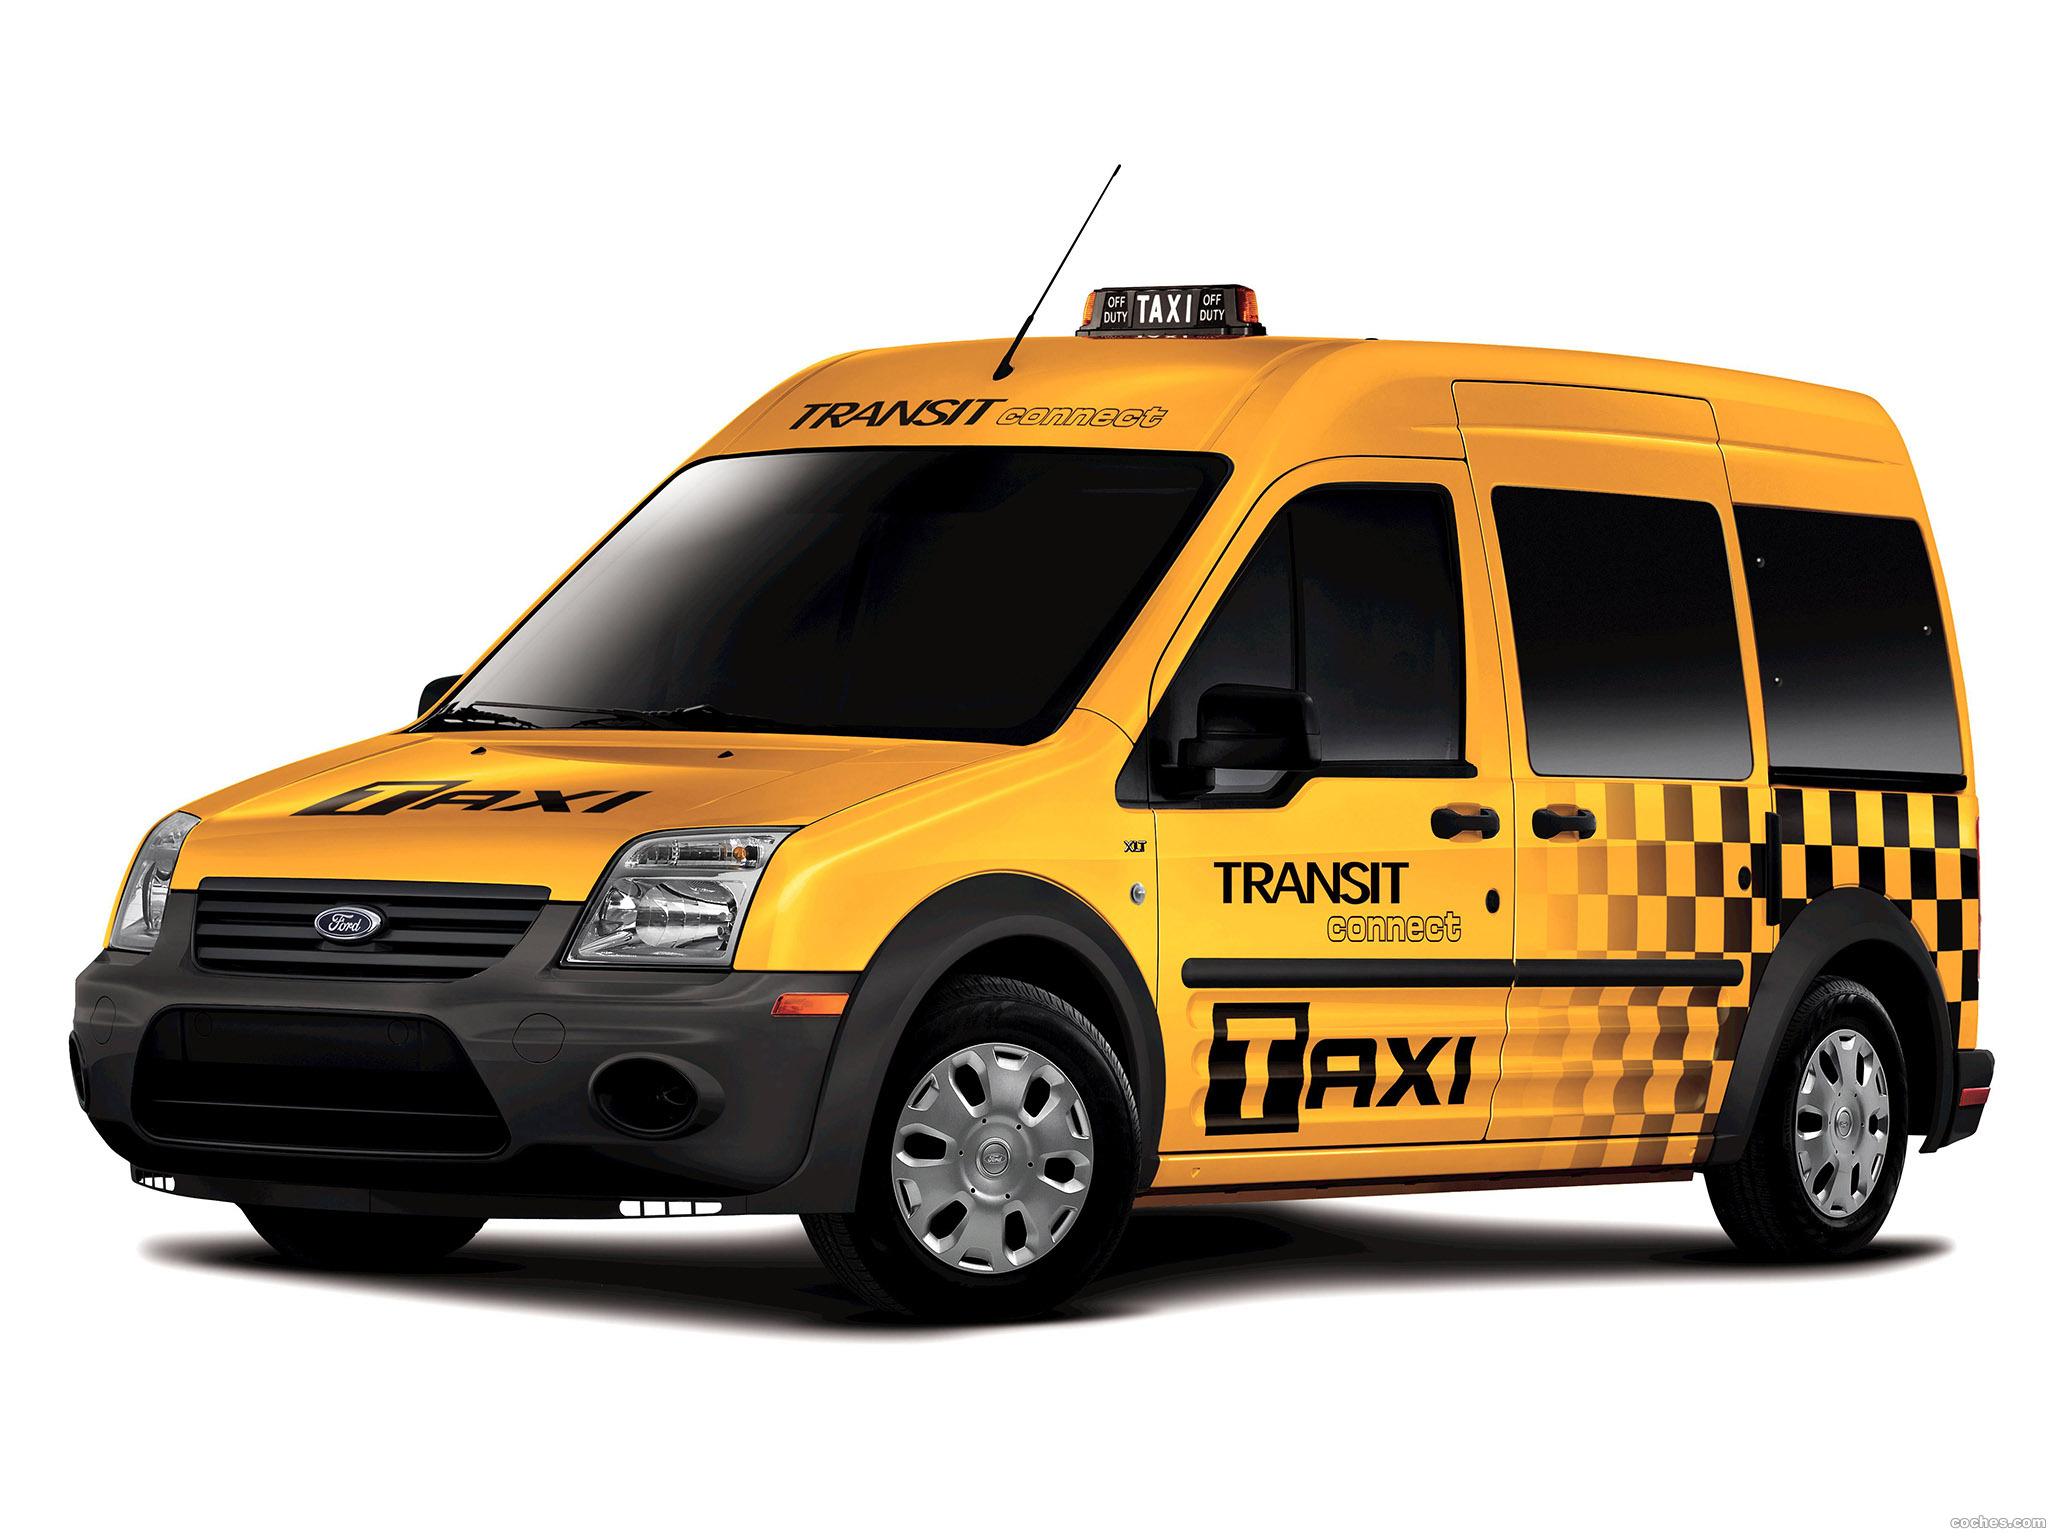 Foto 6 de Ford Transit Connect Taxi 2010